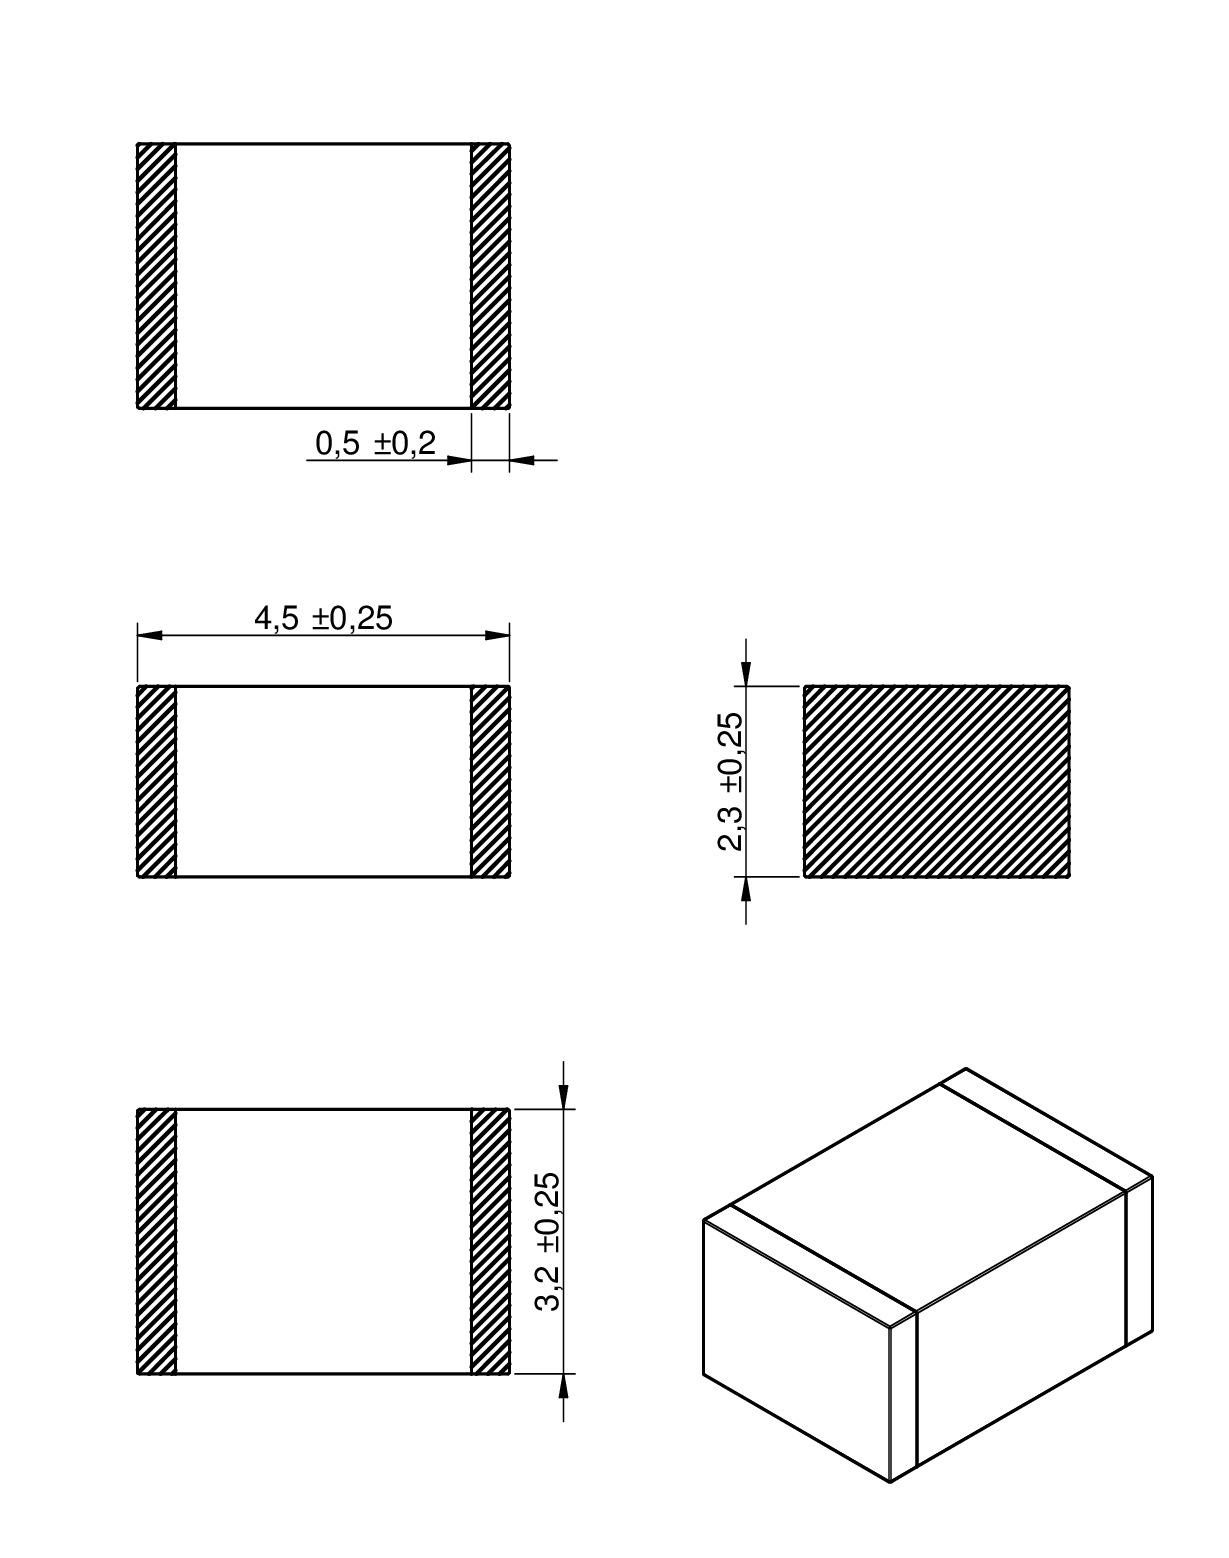 WE-MPSB EMI Multilayer Power Suppression Bead | Passive Components